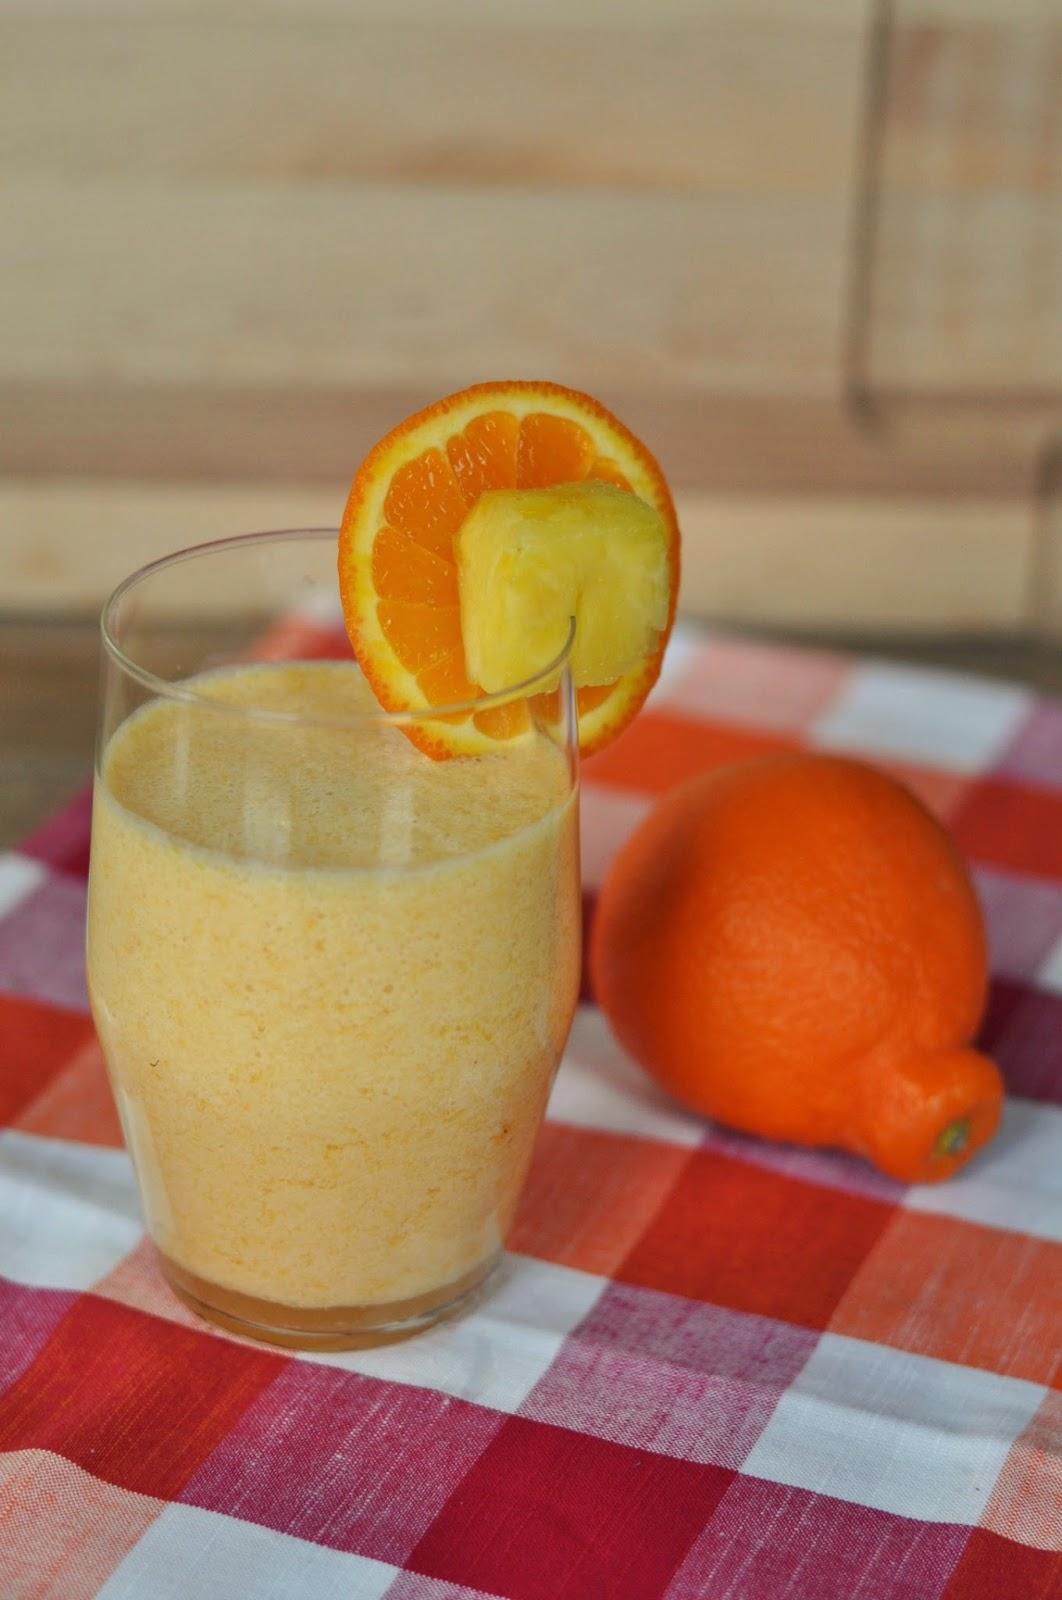 https://www.justusfourblog.com/2014/05/citrus-vanilla-breakfast-smoothie/